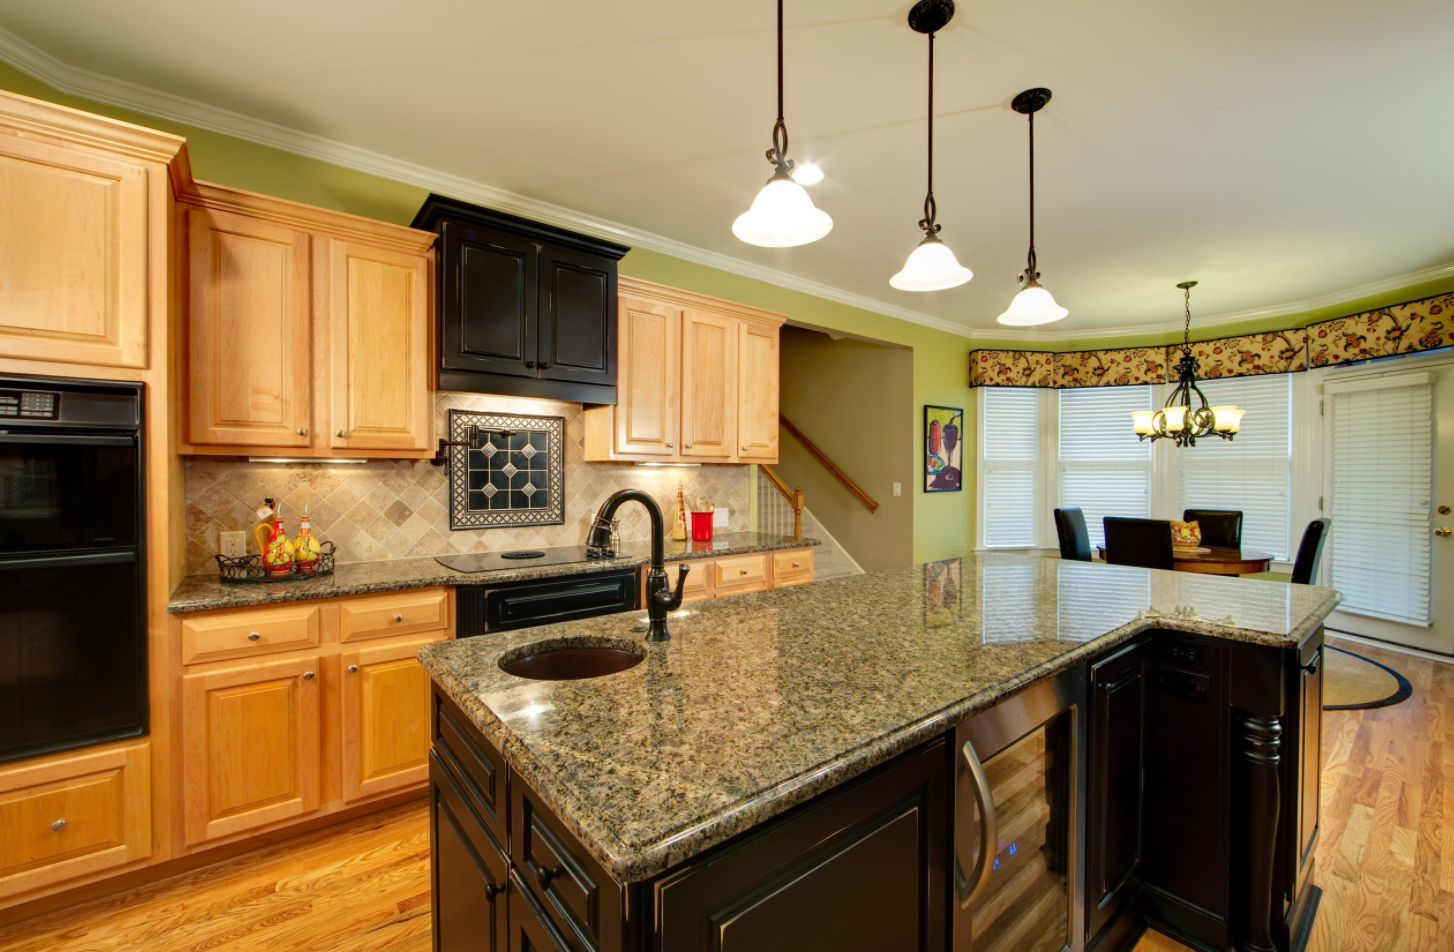 Travertine Backsplash Ideas For Nostalgic Kitchen Designs on What Color Backsplash With Maple Cabinets  id=14021